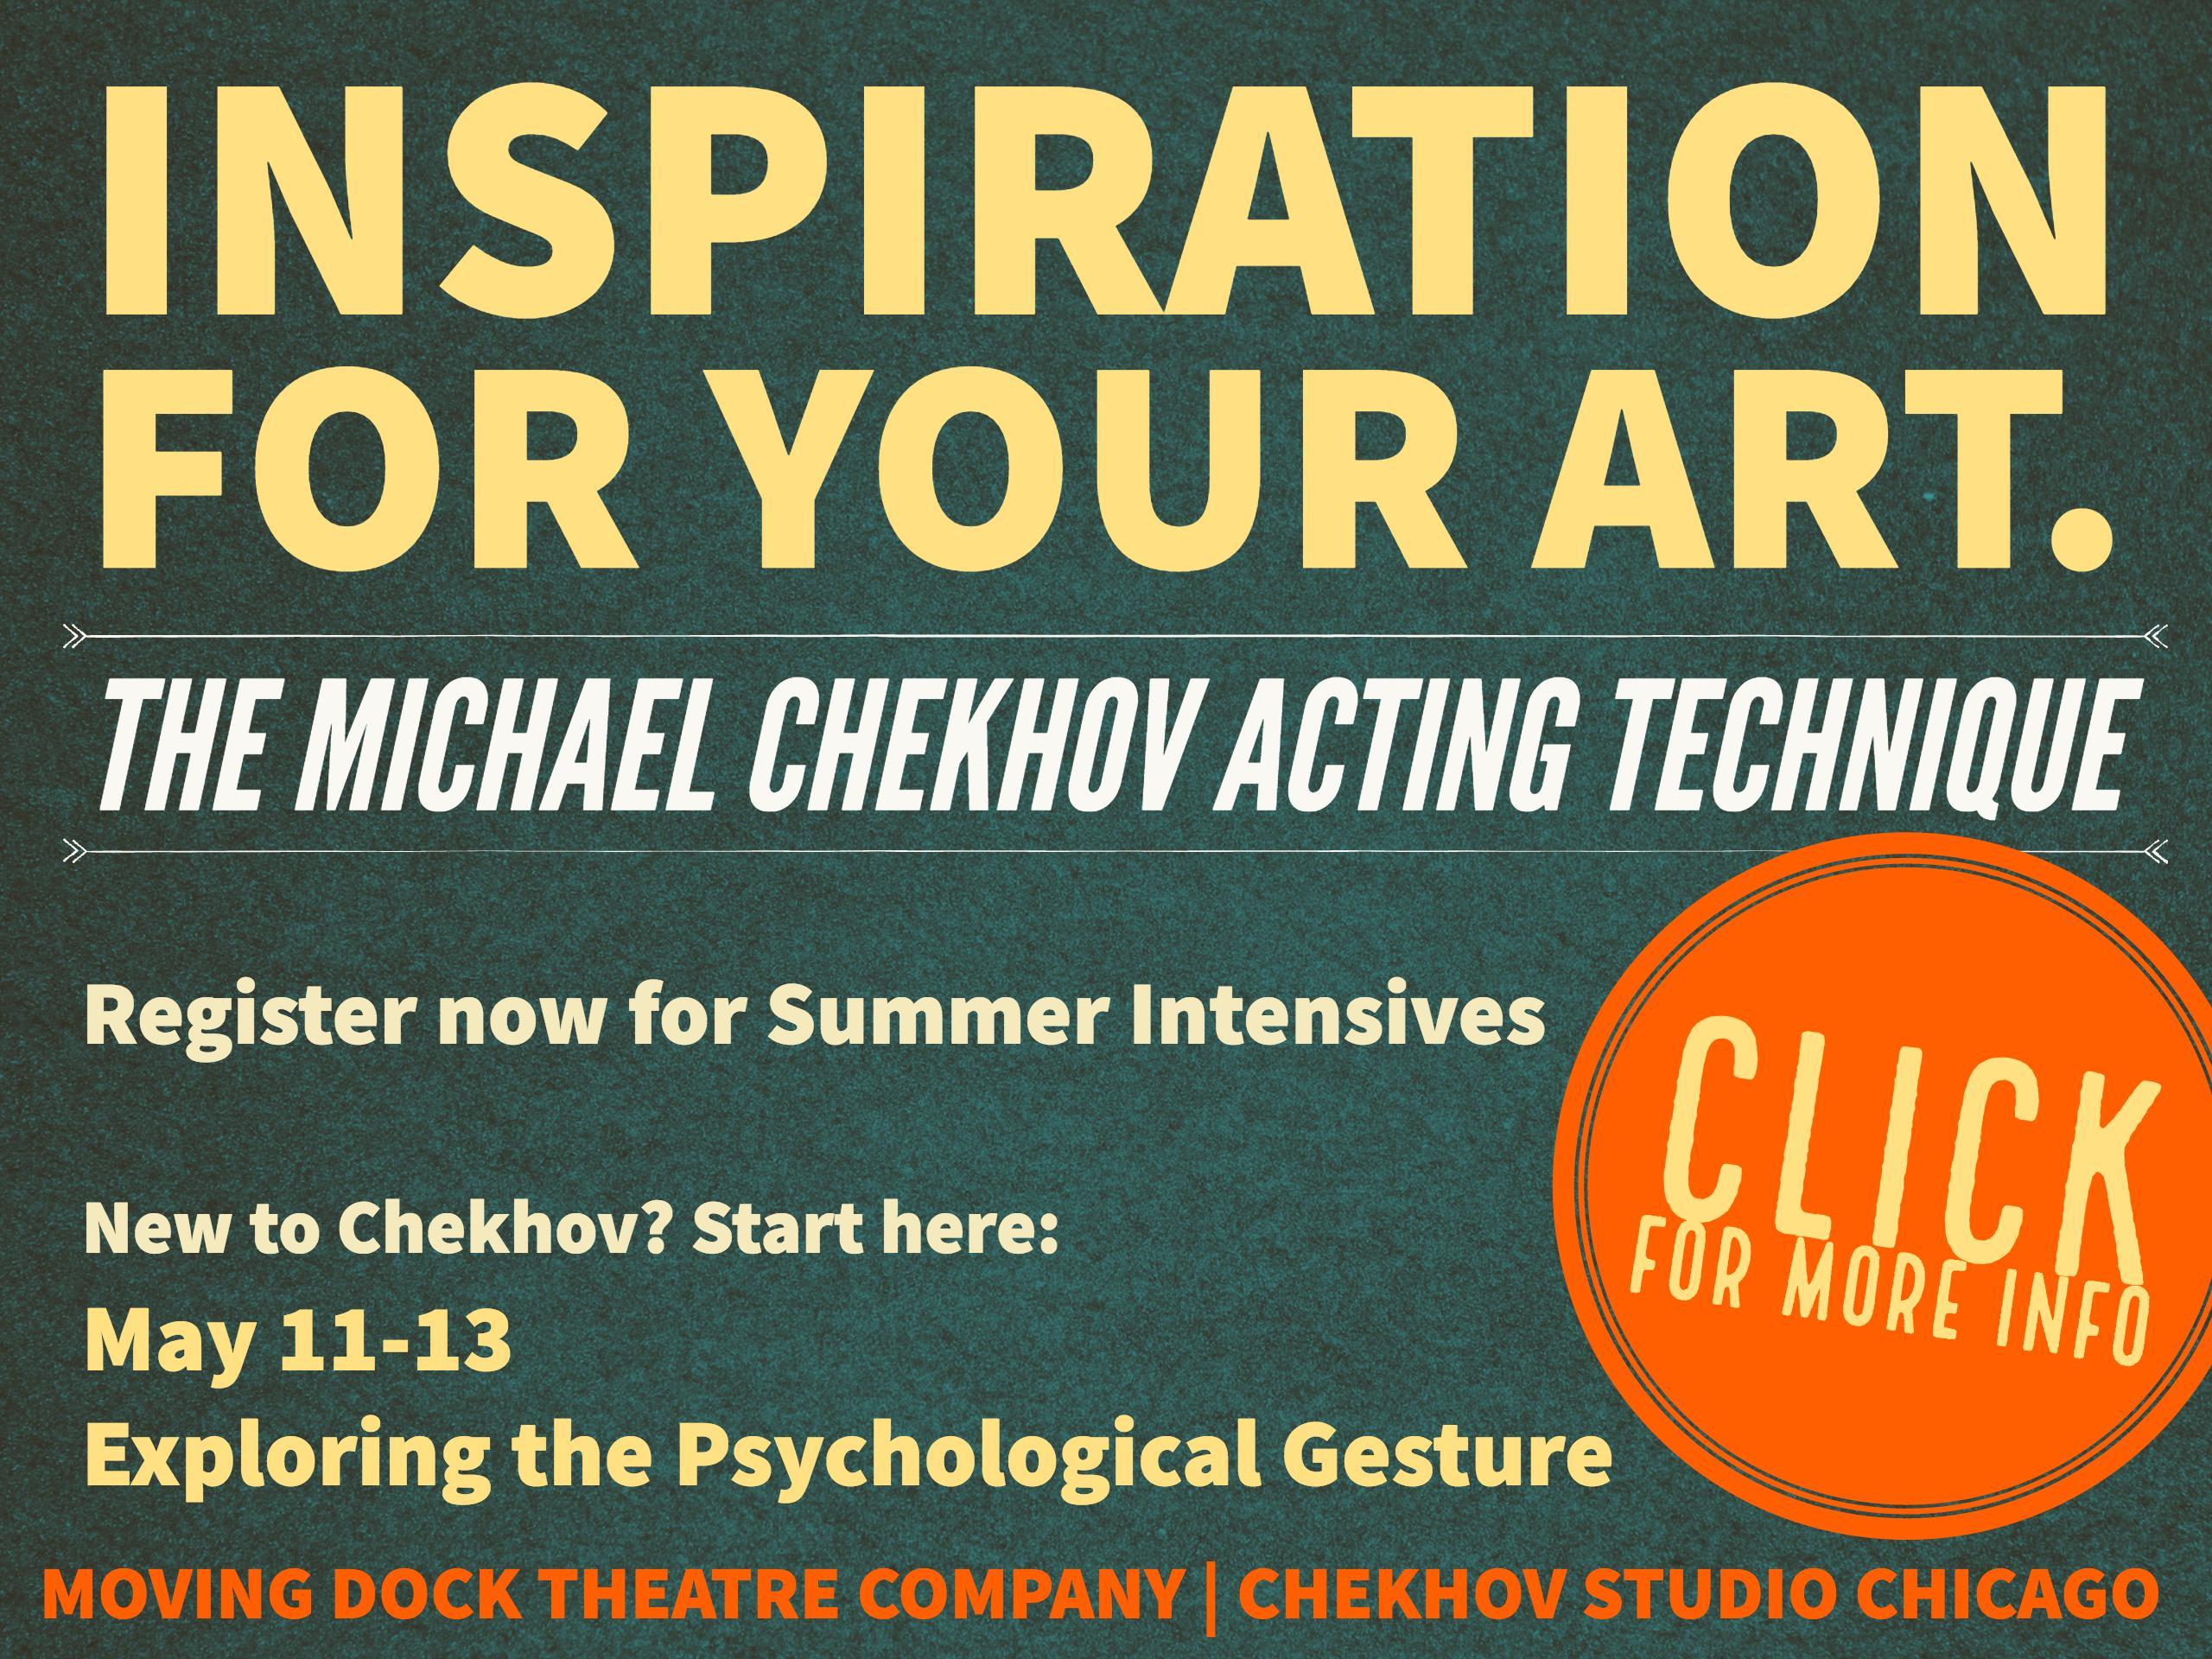 Chekov Studio Chicago